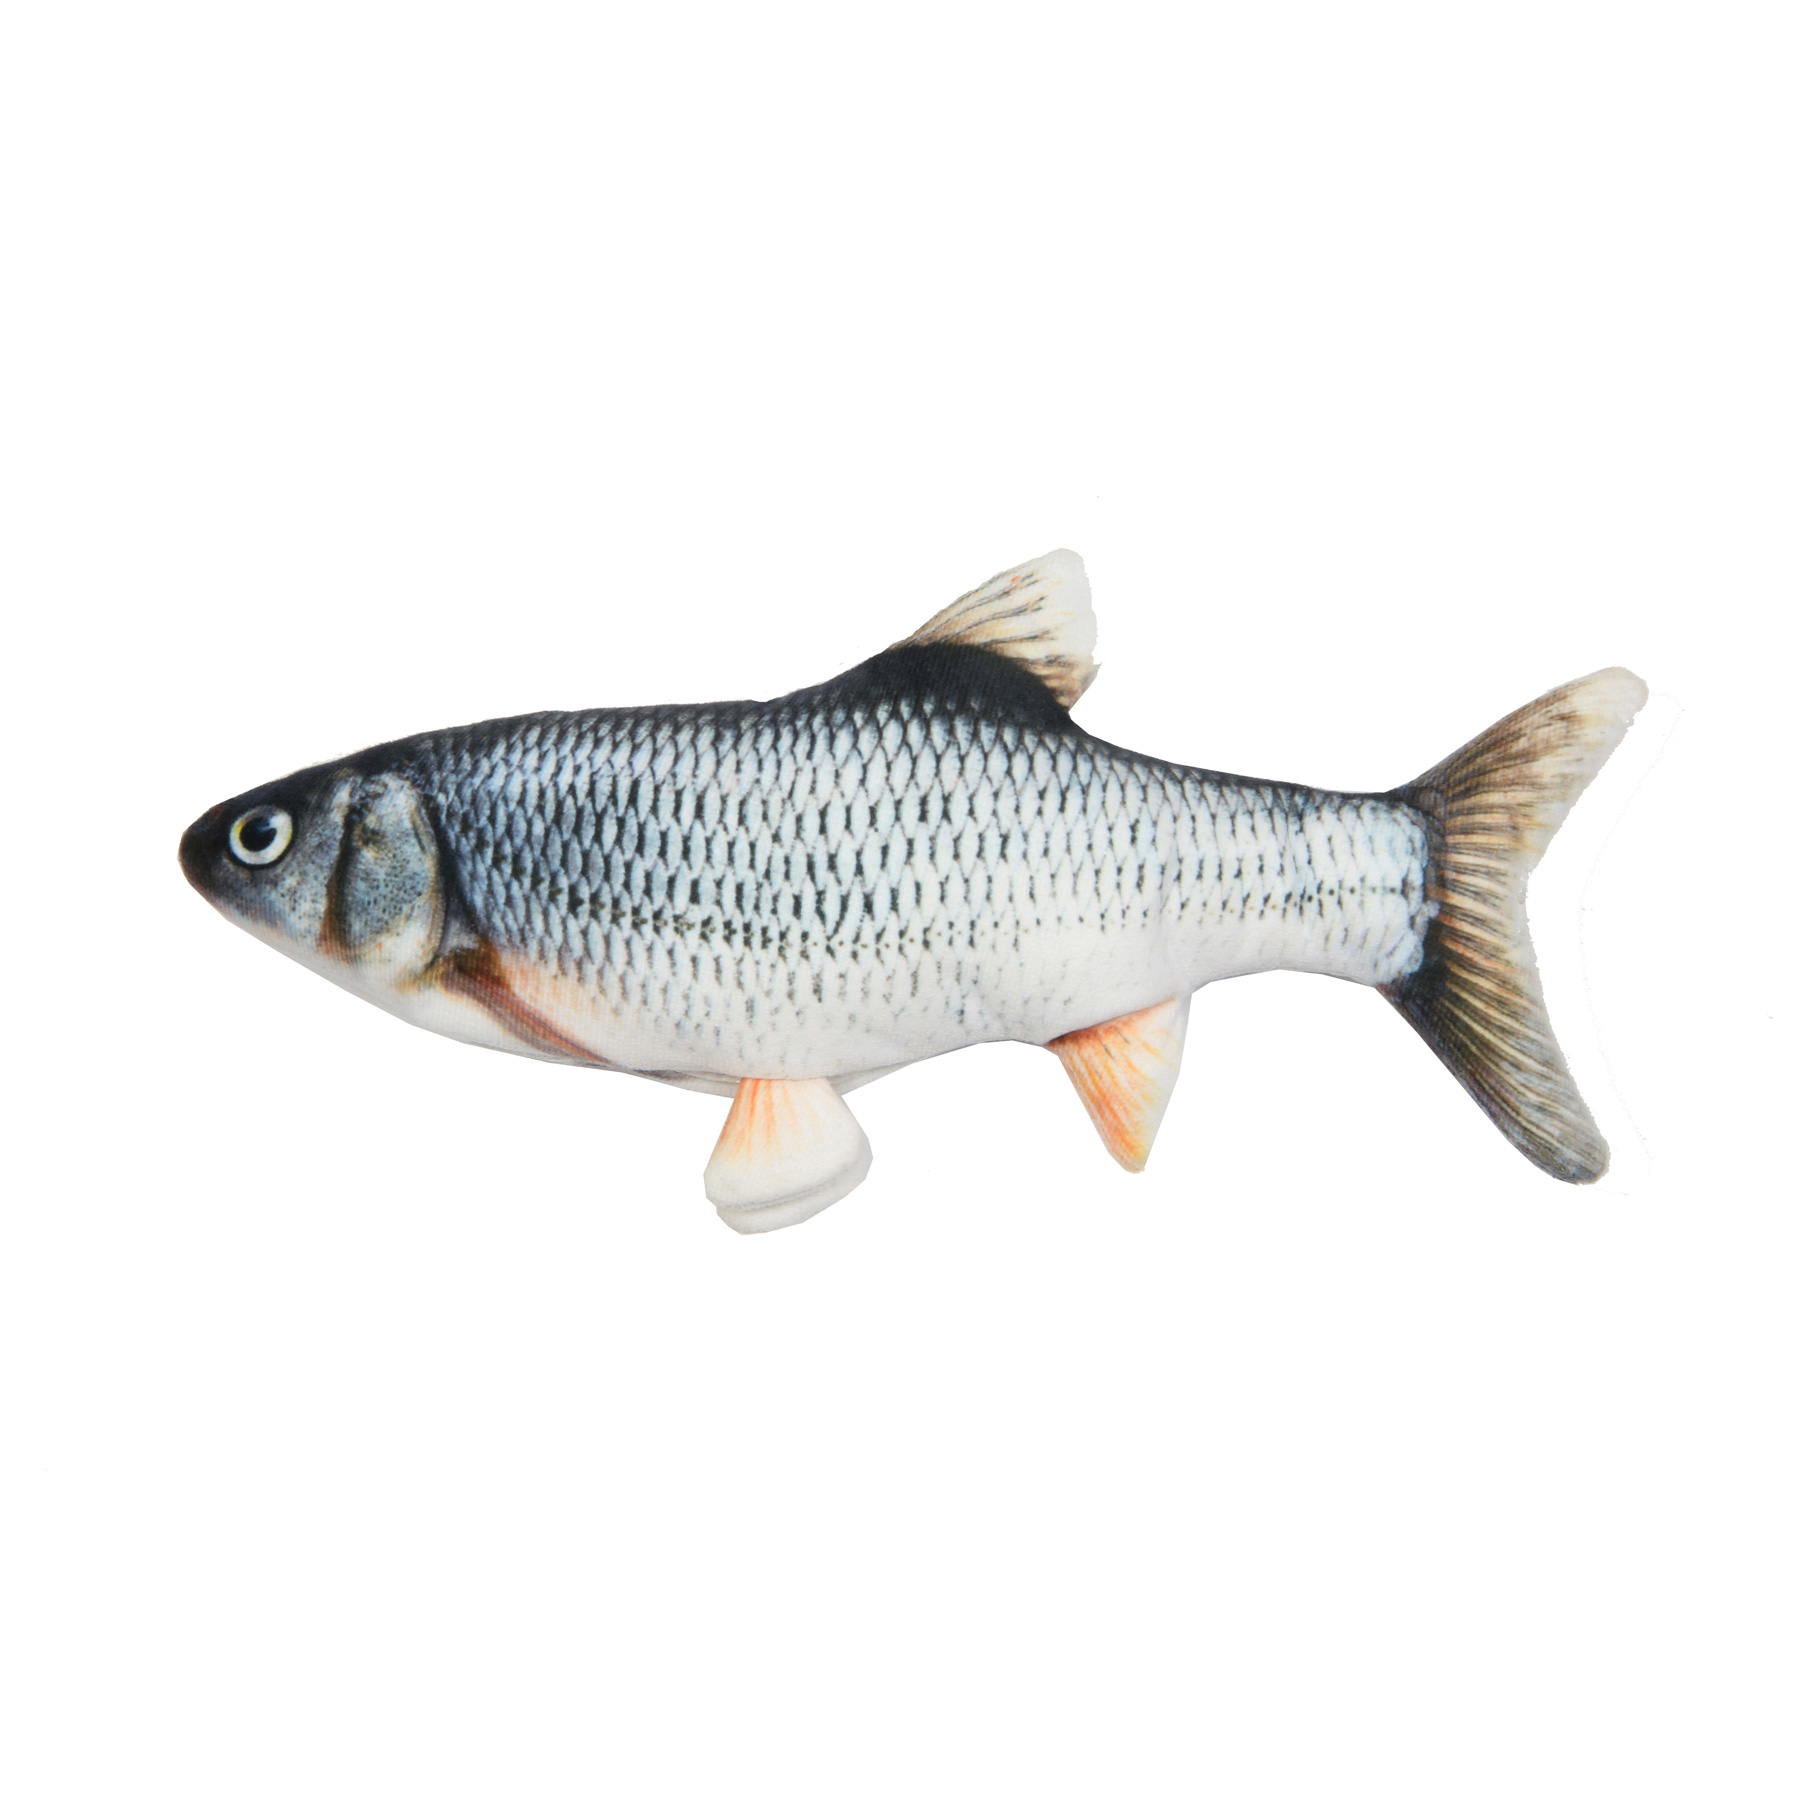 Mackerel touch activated zaFish | zaKatz | cat toy | Meister Trading